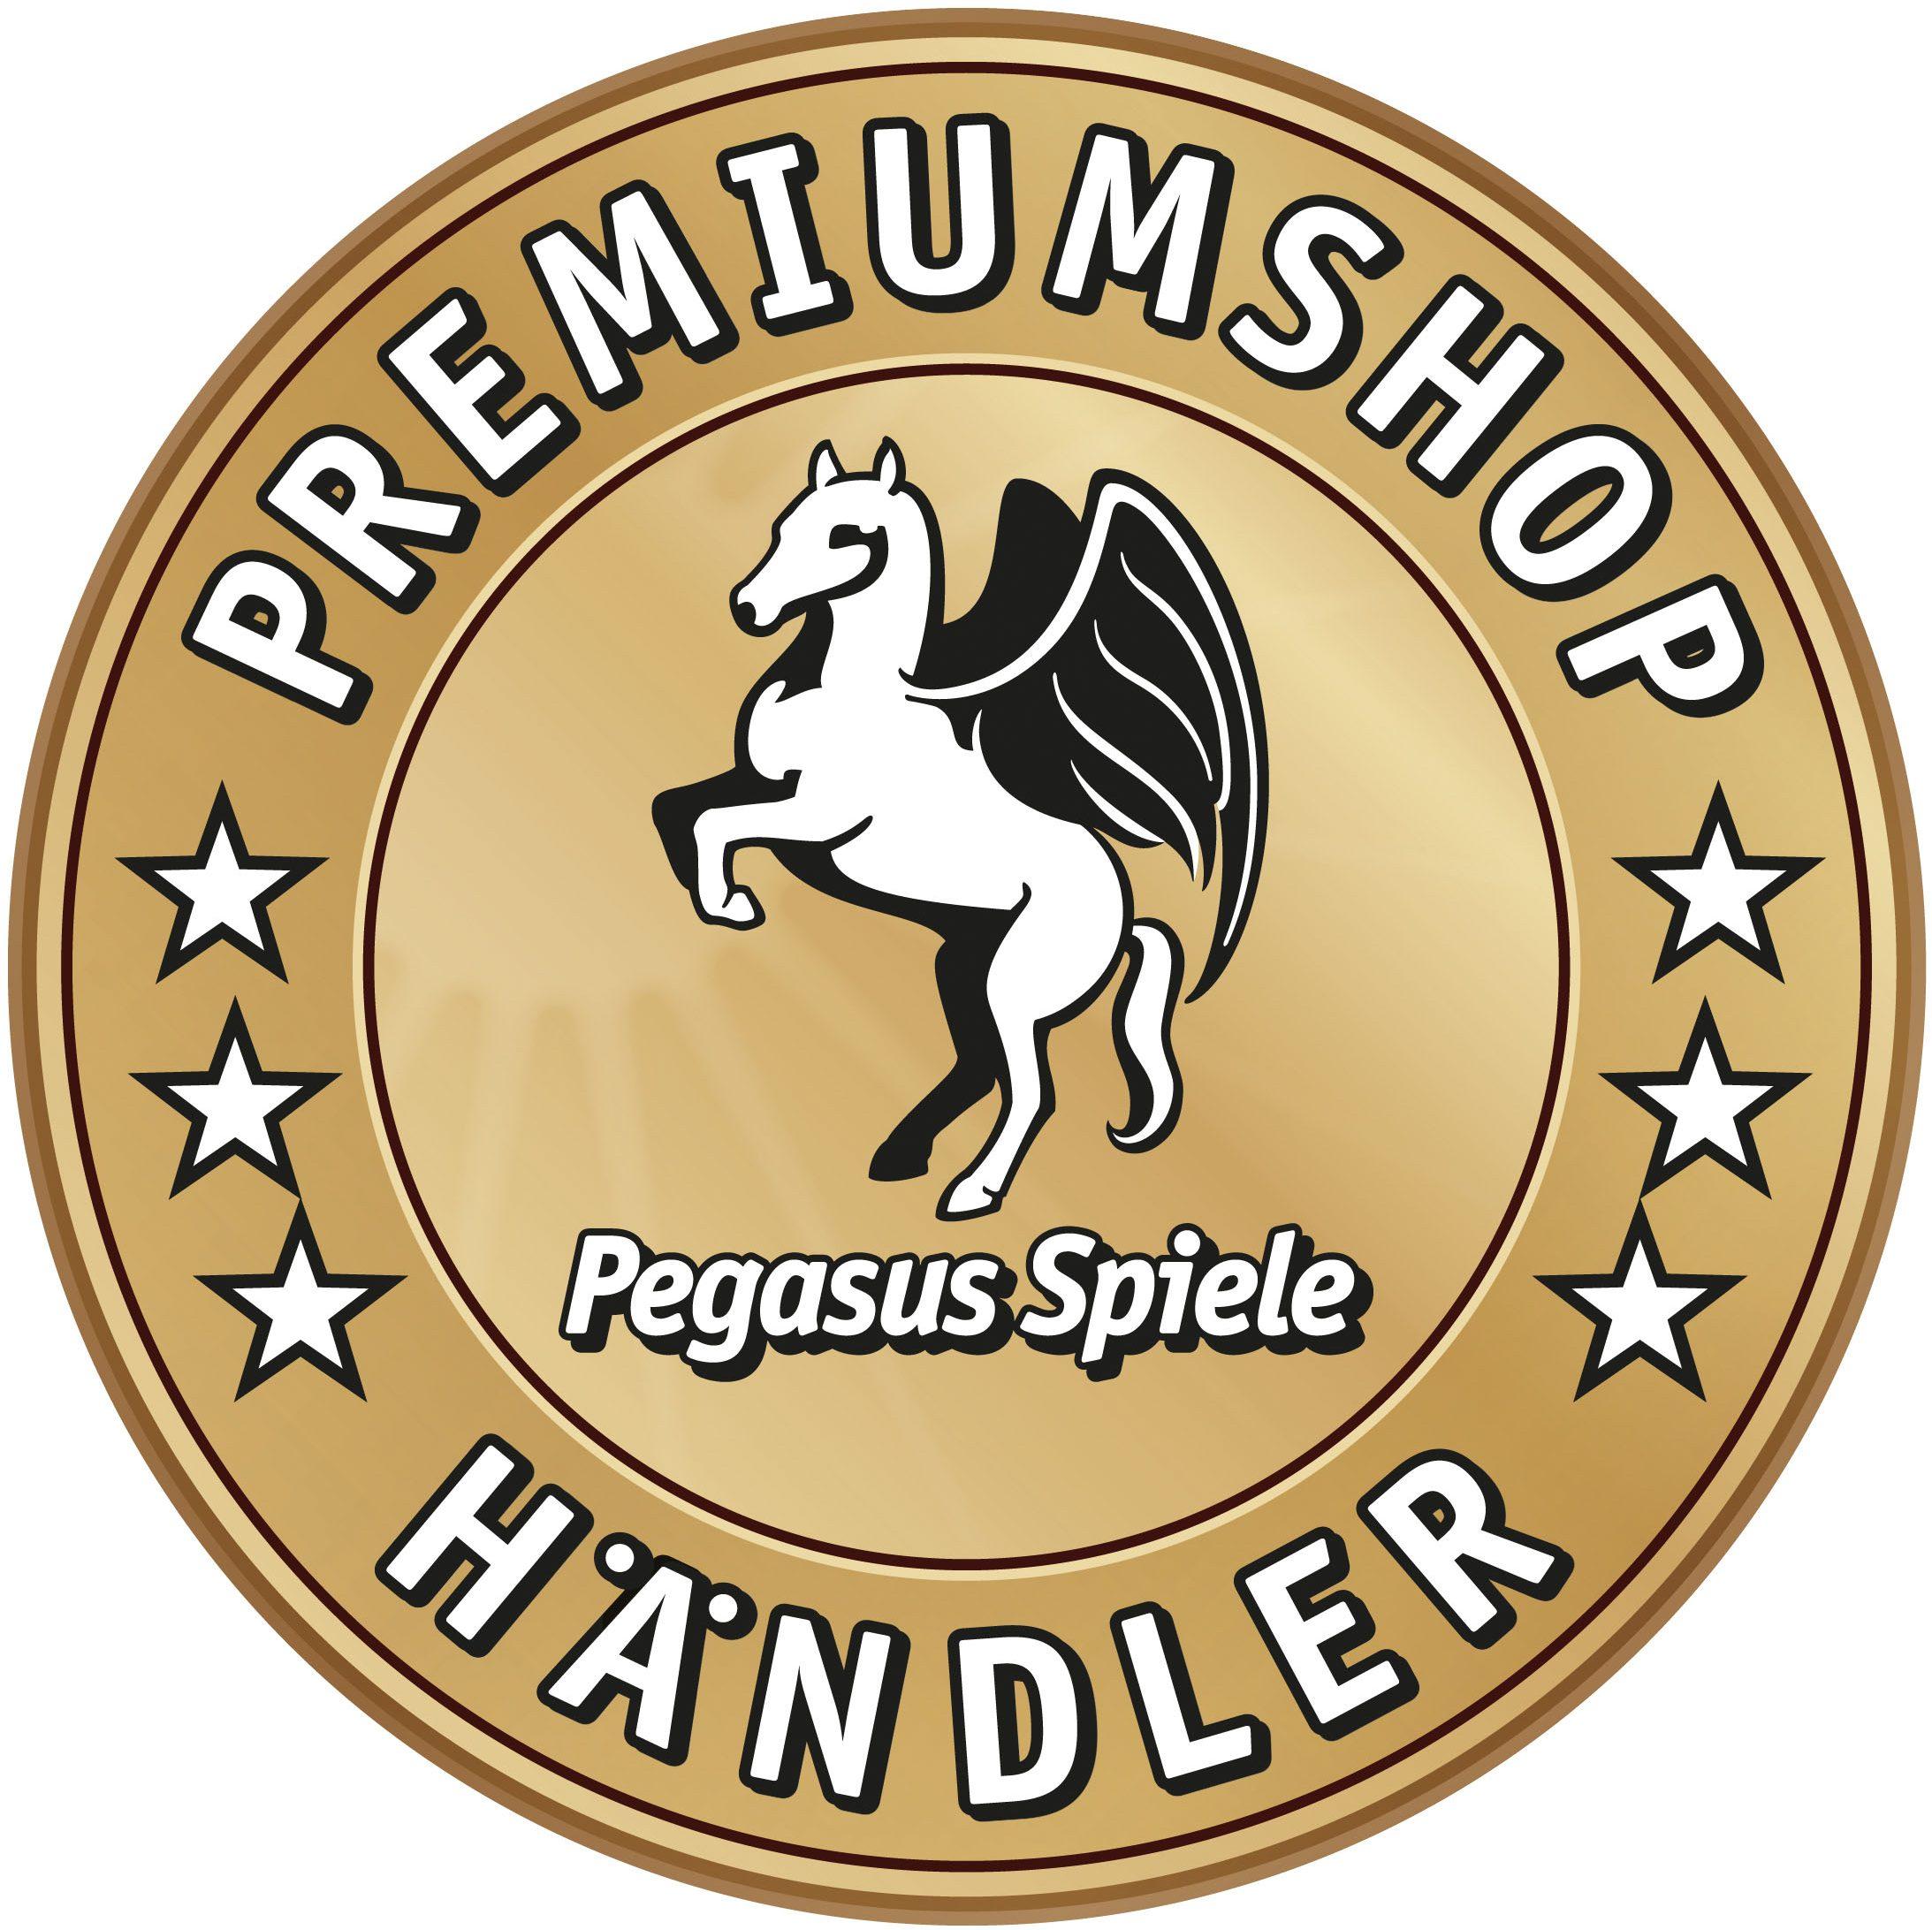 Pegasus Premiumshop Freiburg